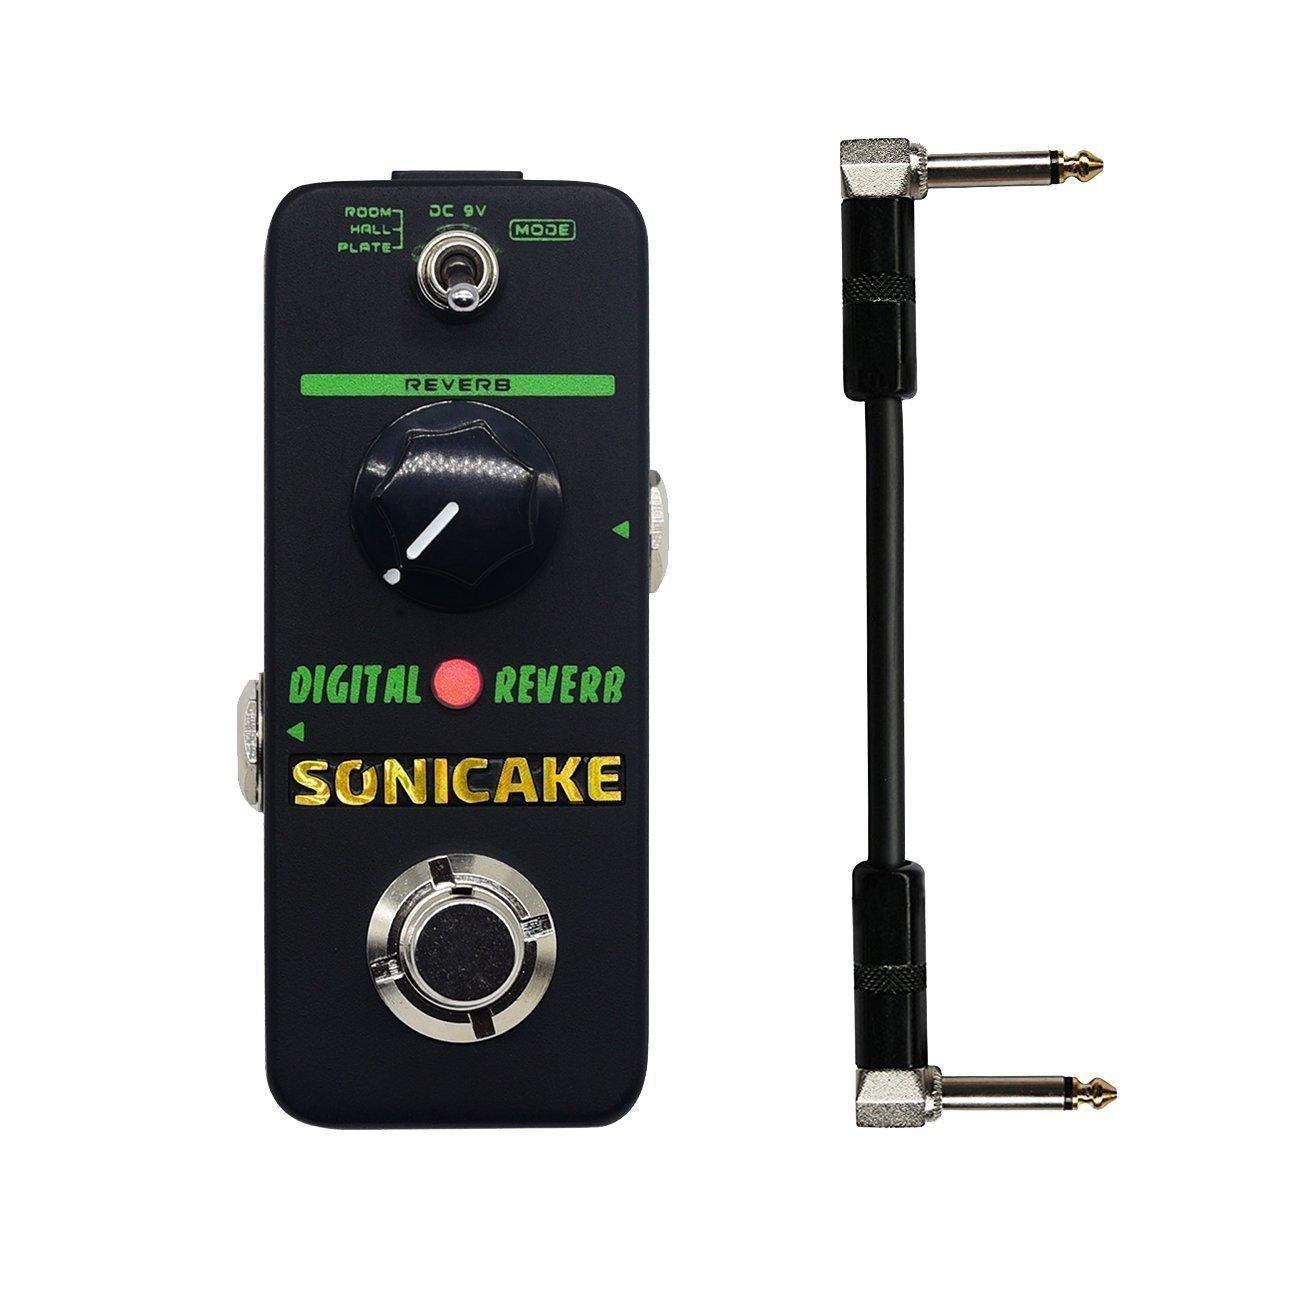 SONICAKE Digital Reverb Mini Guitar Effects Pedal True Bypass 4334186533